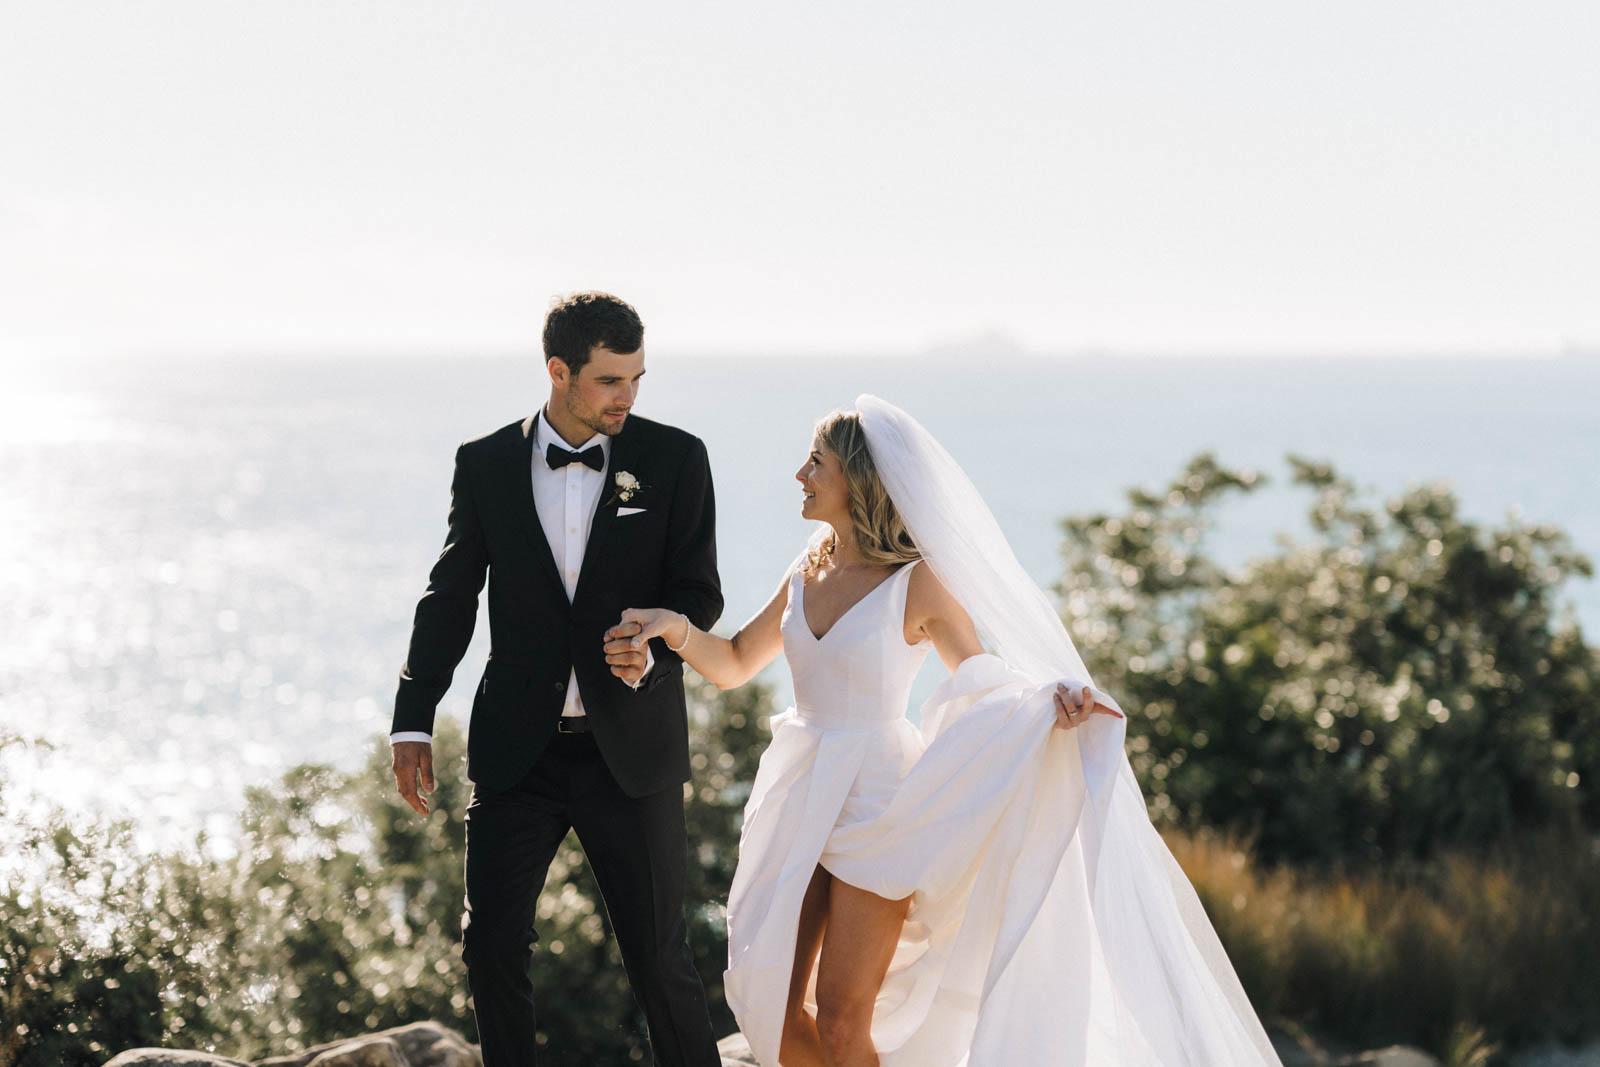 newfound-s-p-mt-maunganui-tauranga-wedding-photographer-1554-A9_05576